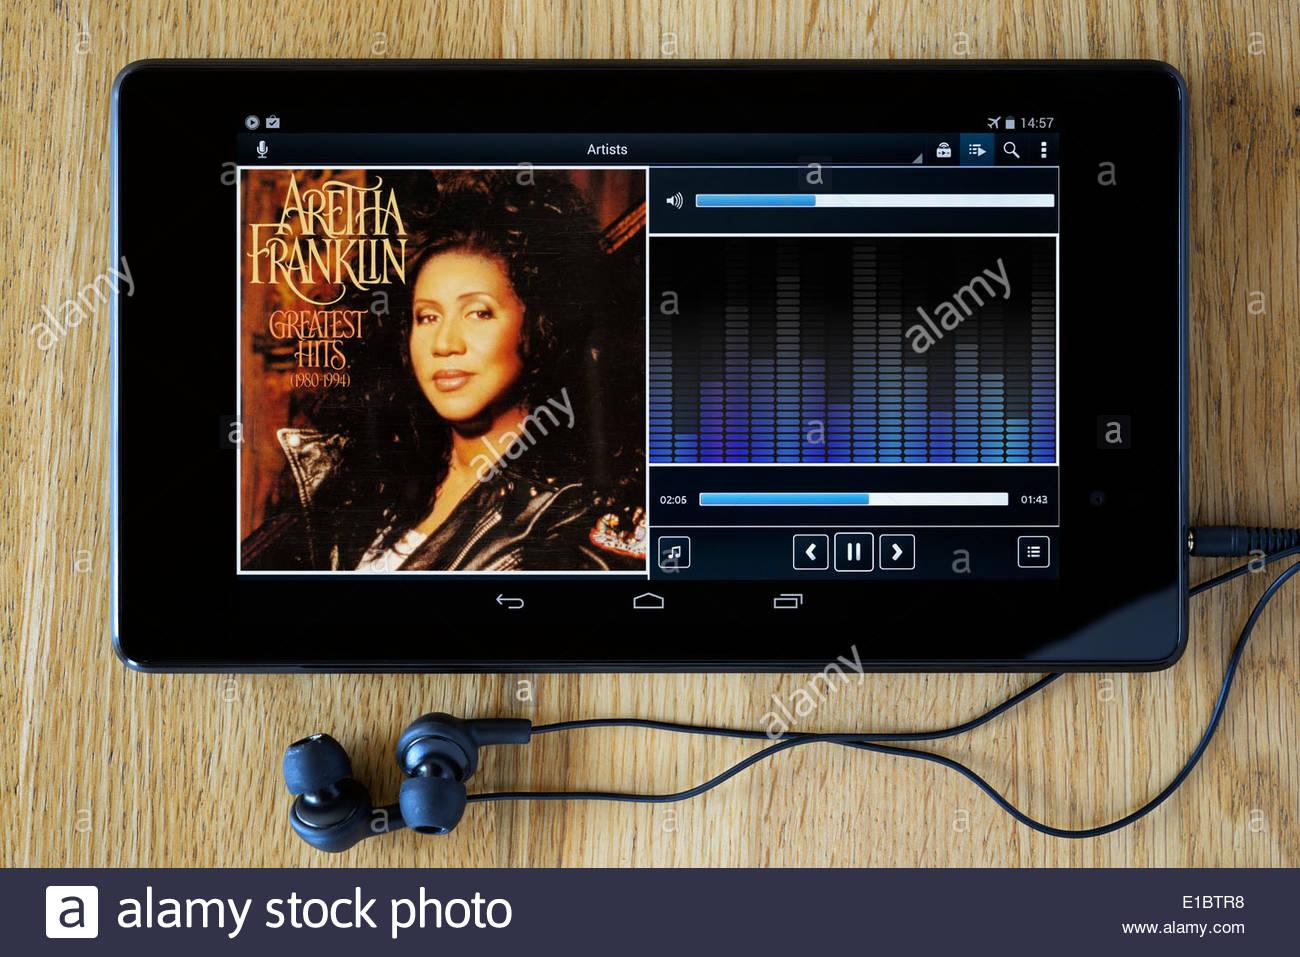 Aretha Franklin greatest Hits-Album, MP3 Album-Cover auf PC Tablet, England Stockfoto